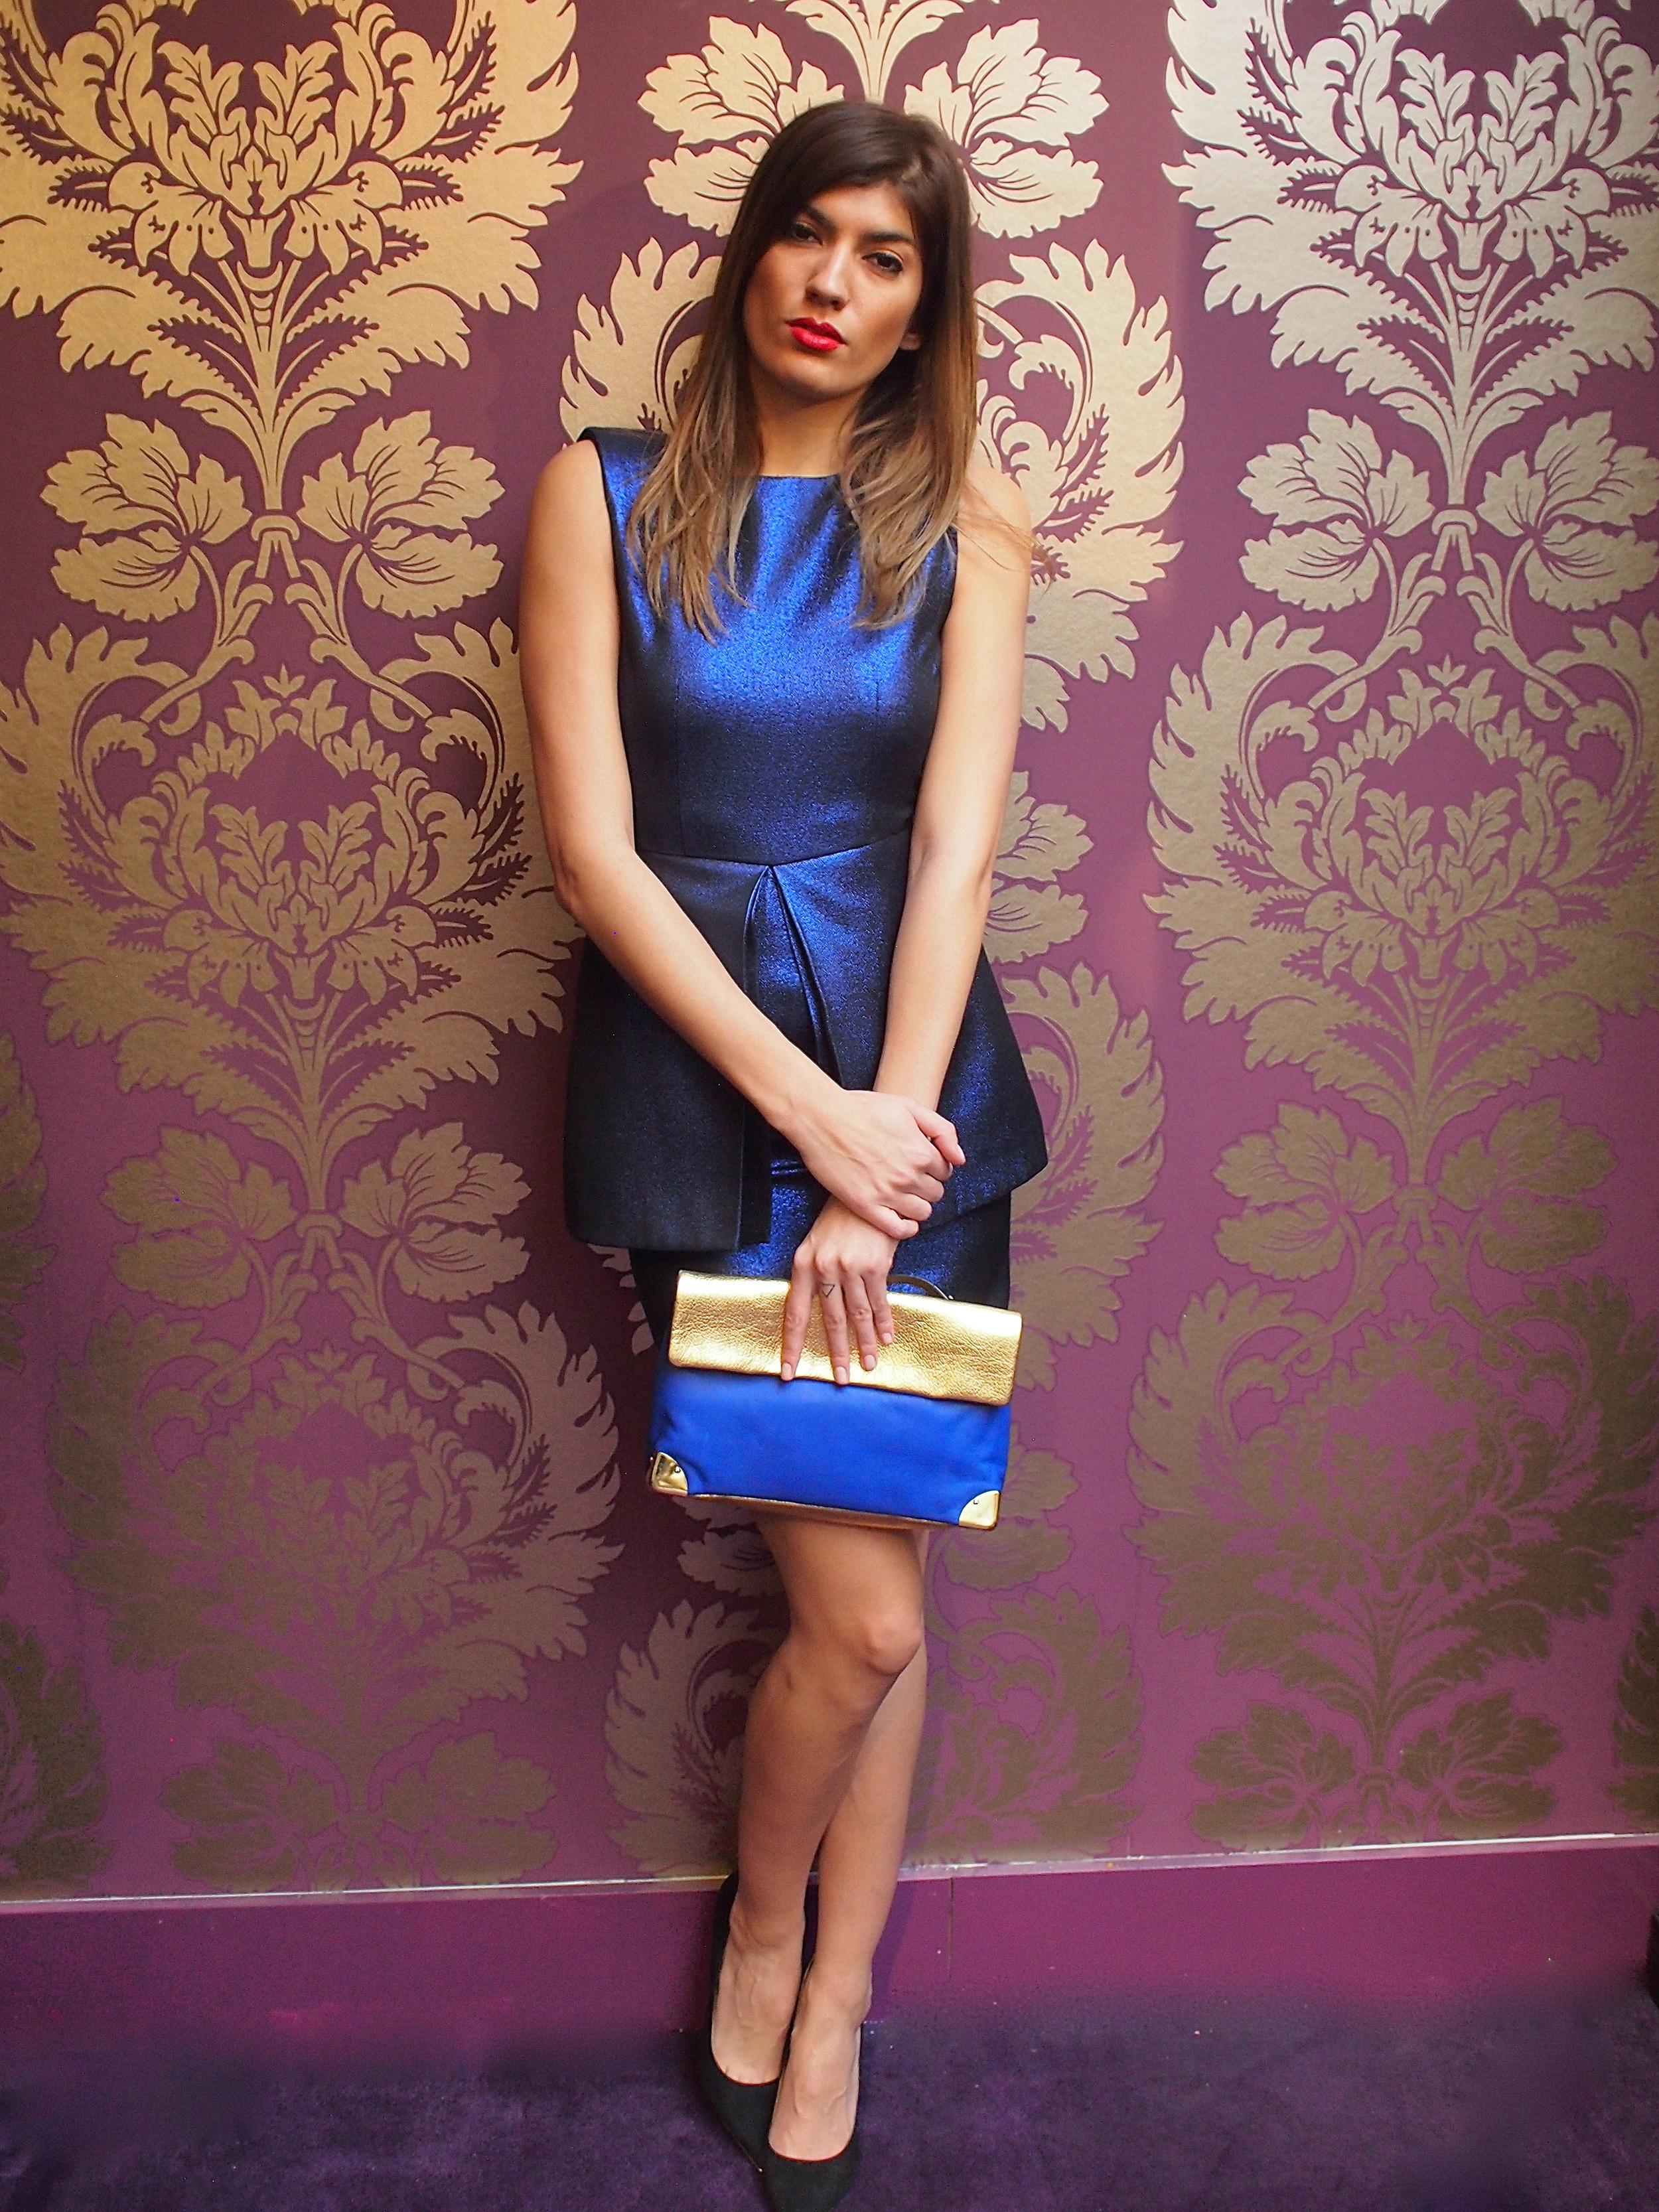 Tiger of Sweden - Chantelle Dress $339, Golden Lane - Gold and Blue Duo Clutch $299, Dolce Vita - Yanni Pump $215